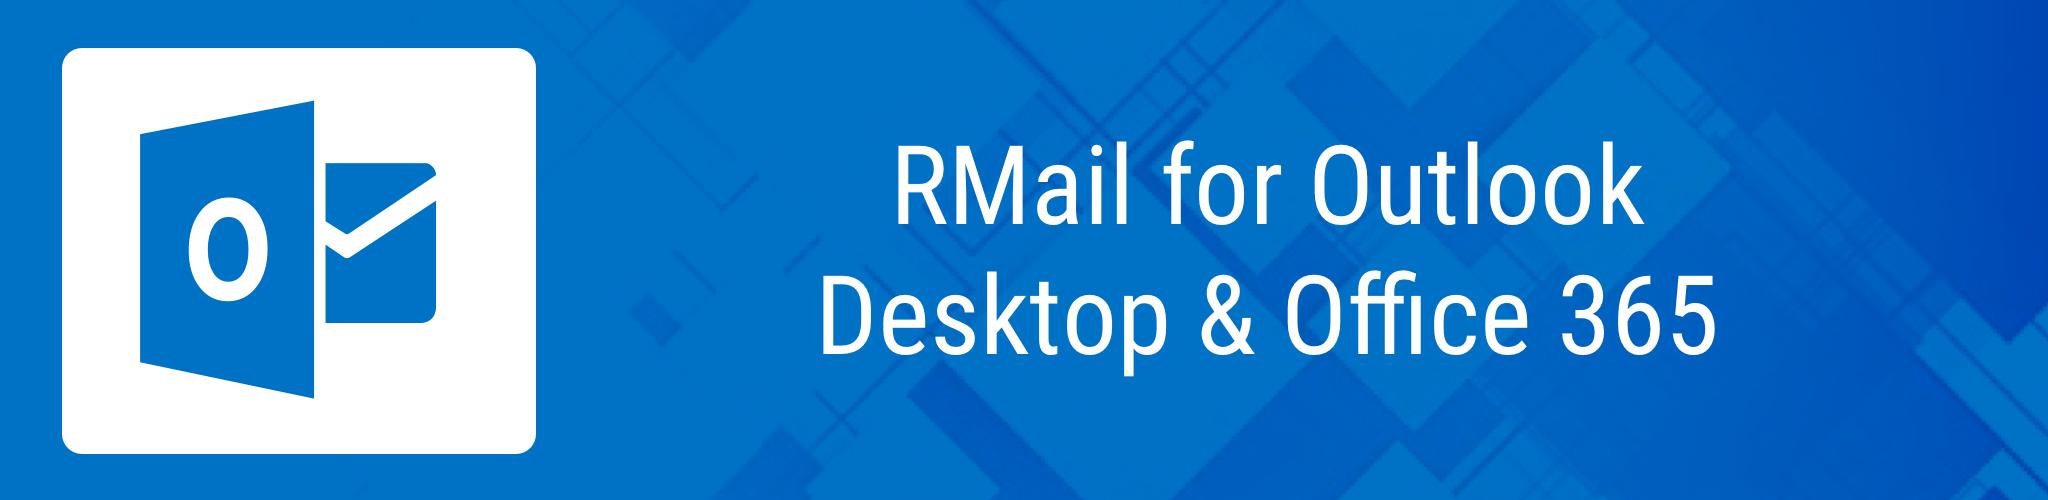 RMail for Outlook Desktop & Office 365